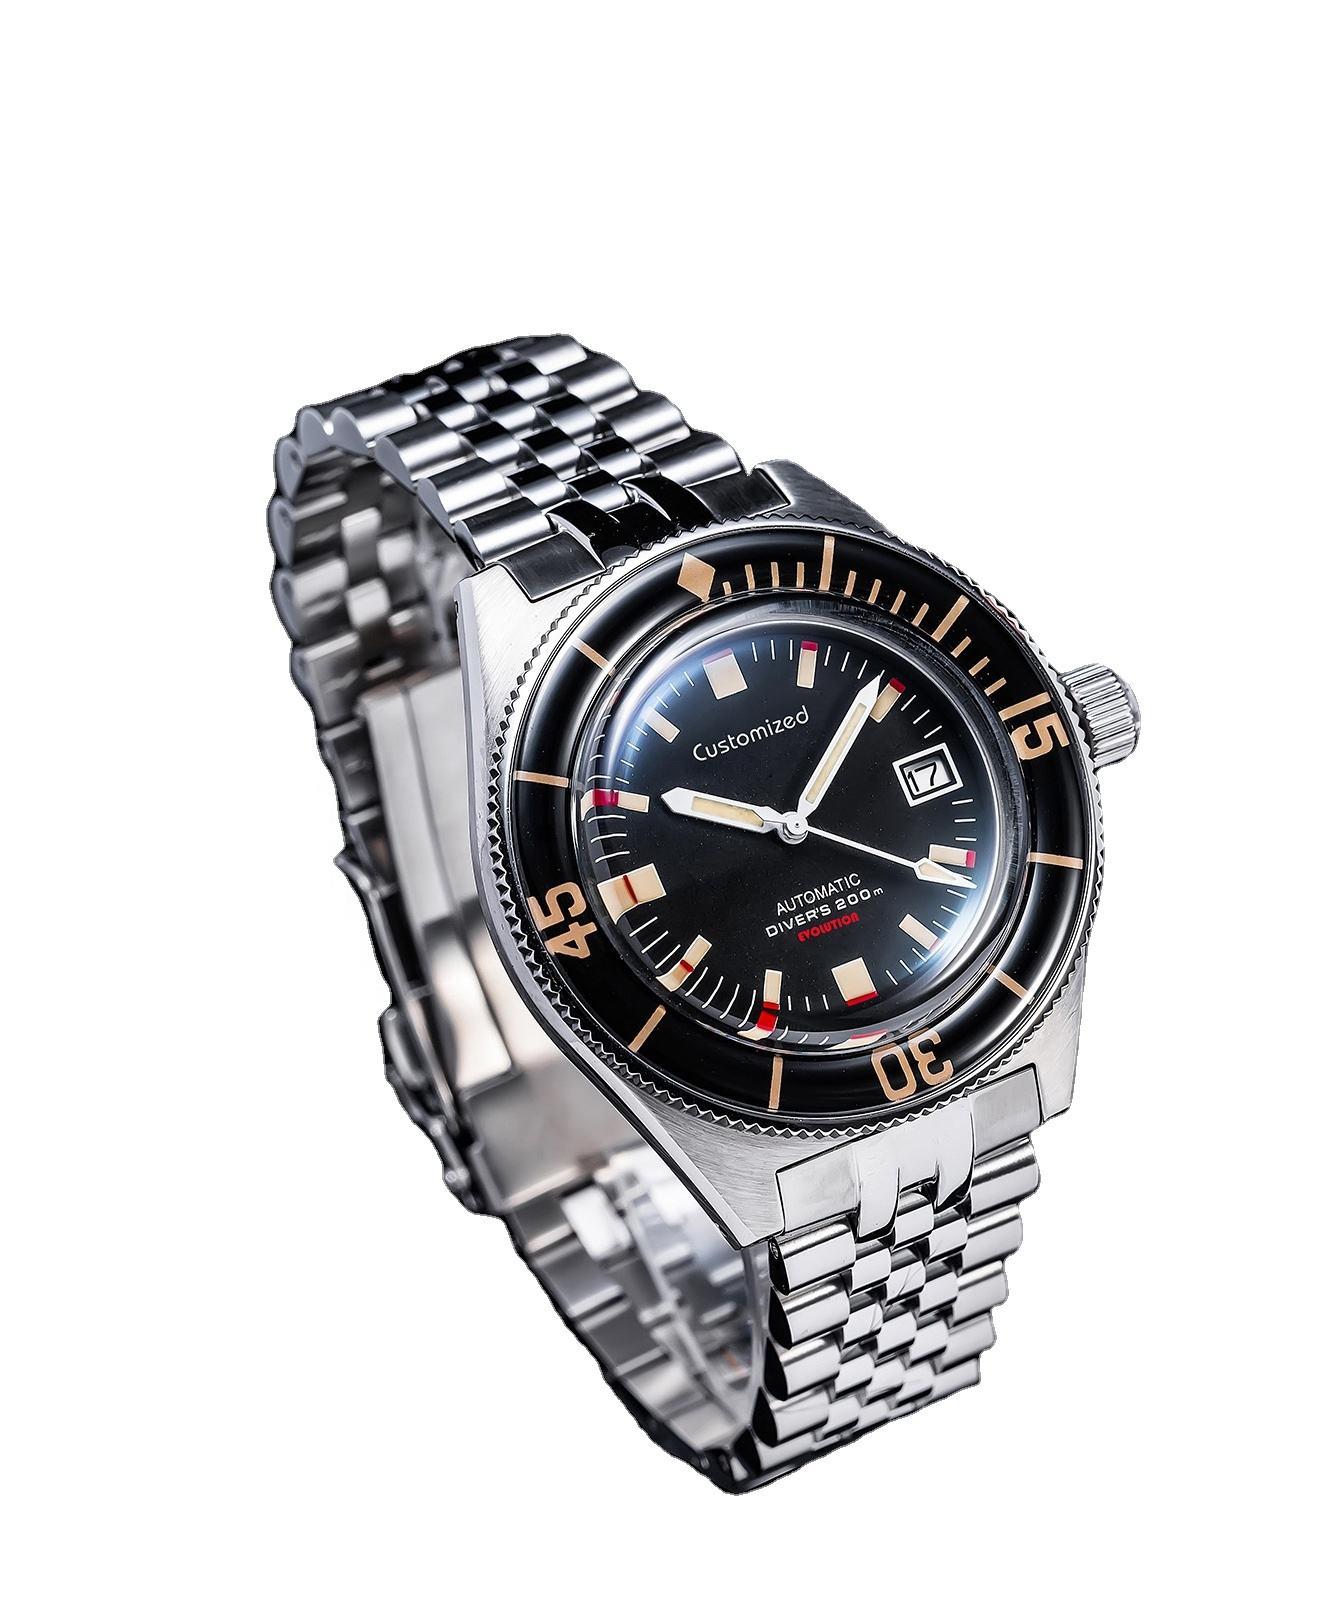 High-quality 50 Fathoms Style Divers Automatic Watch Sapphire Luminous Bezel 20ATM Marine Wrist Watch